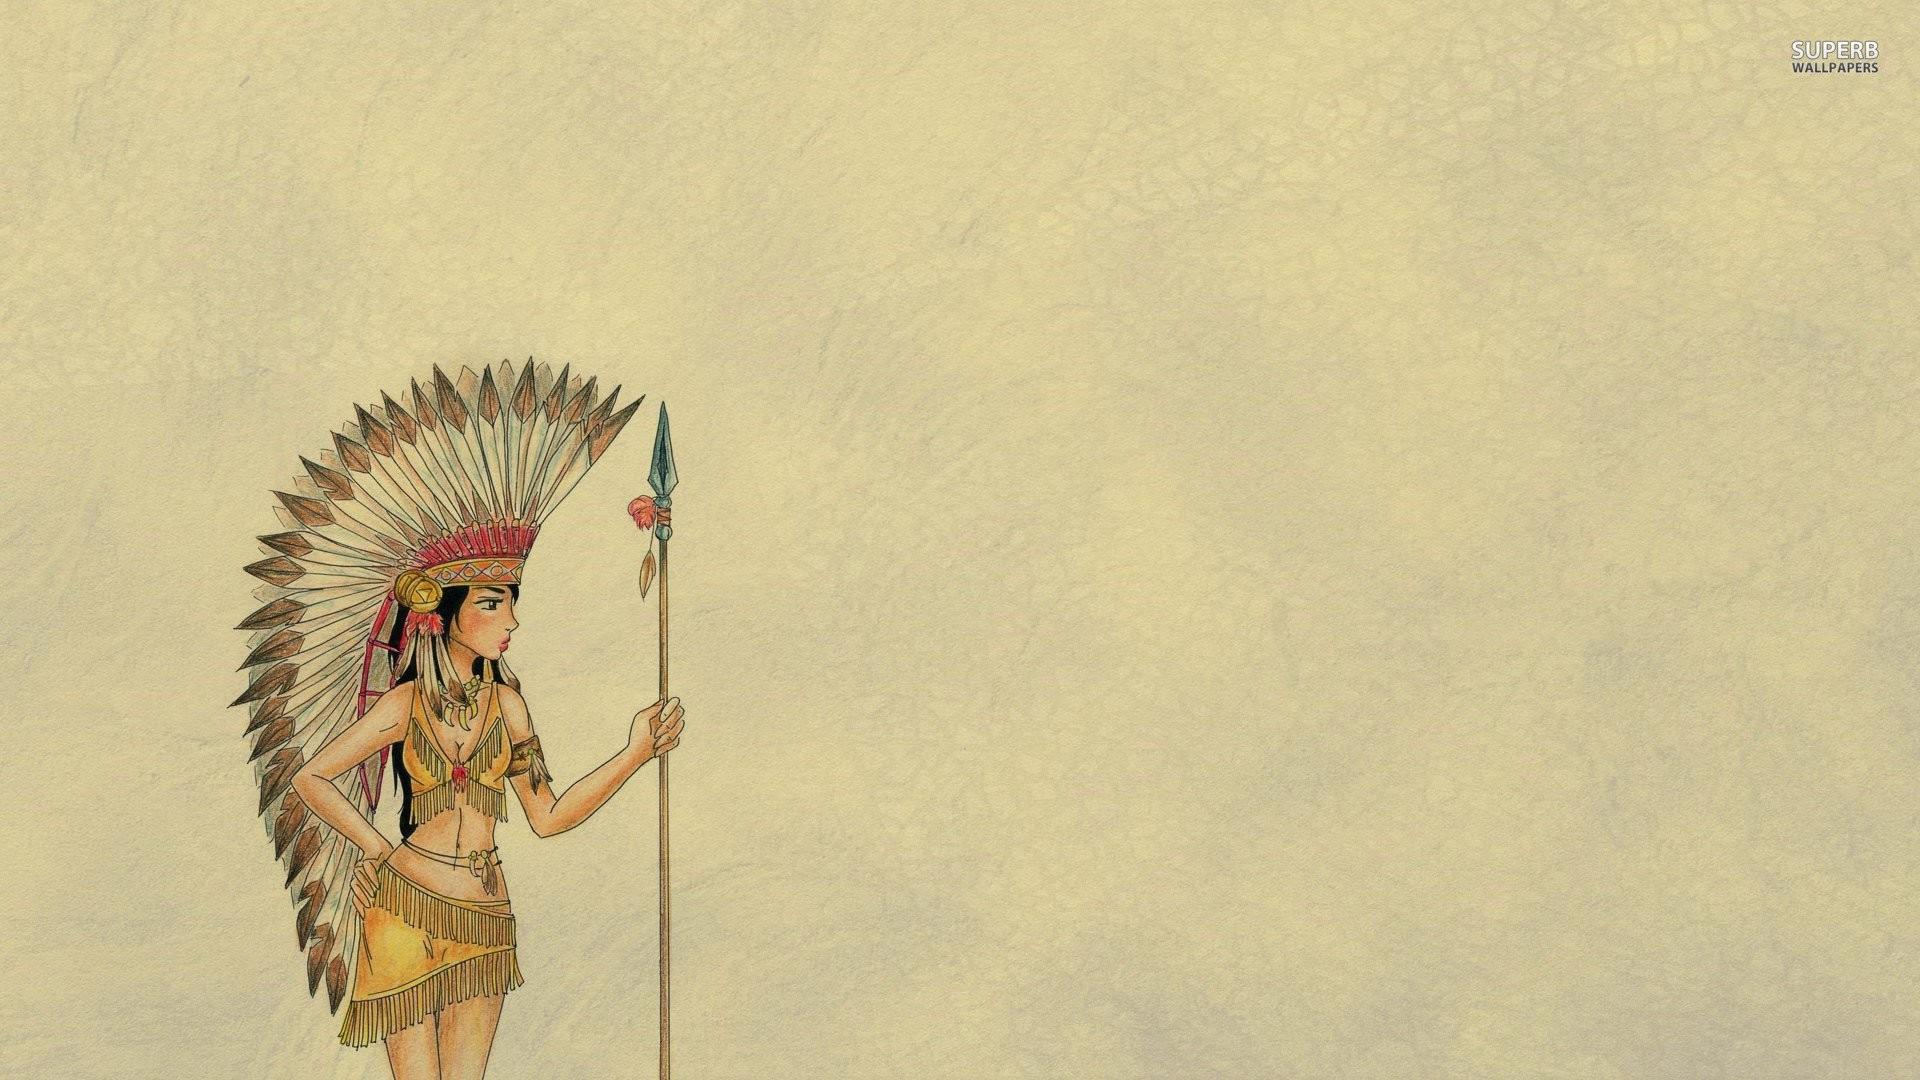 … wallpaper id 504866; minimalistic native american walldevil …